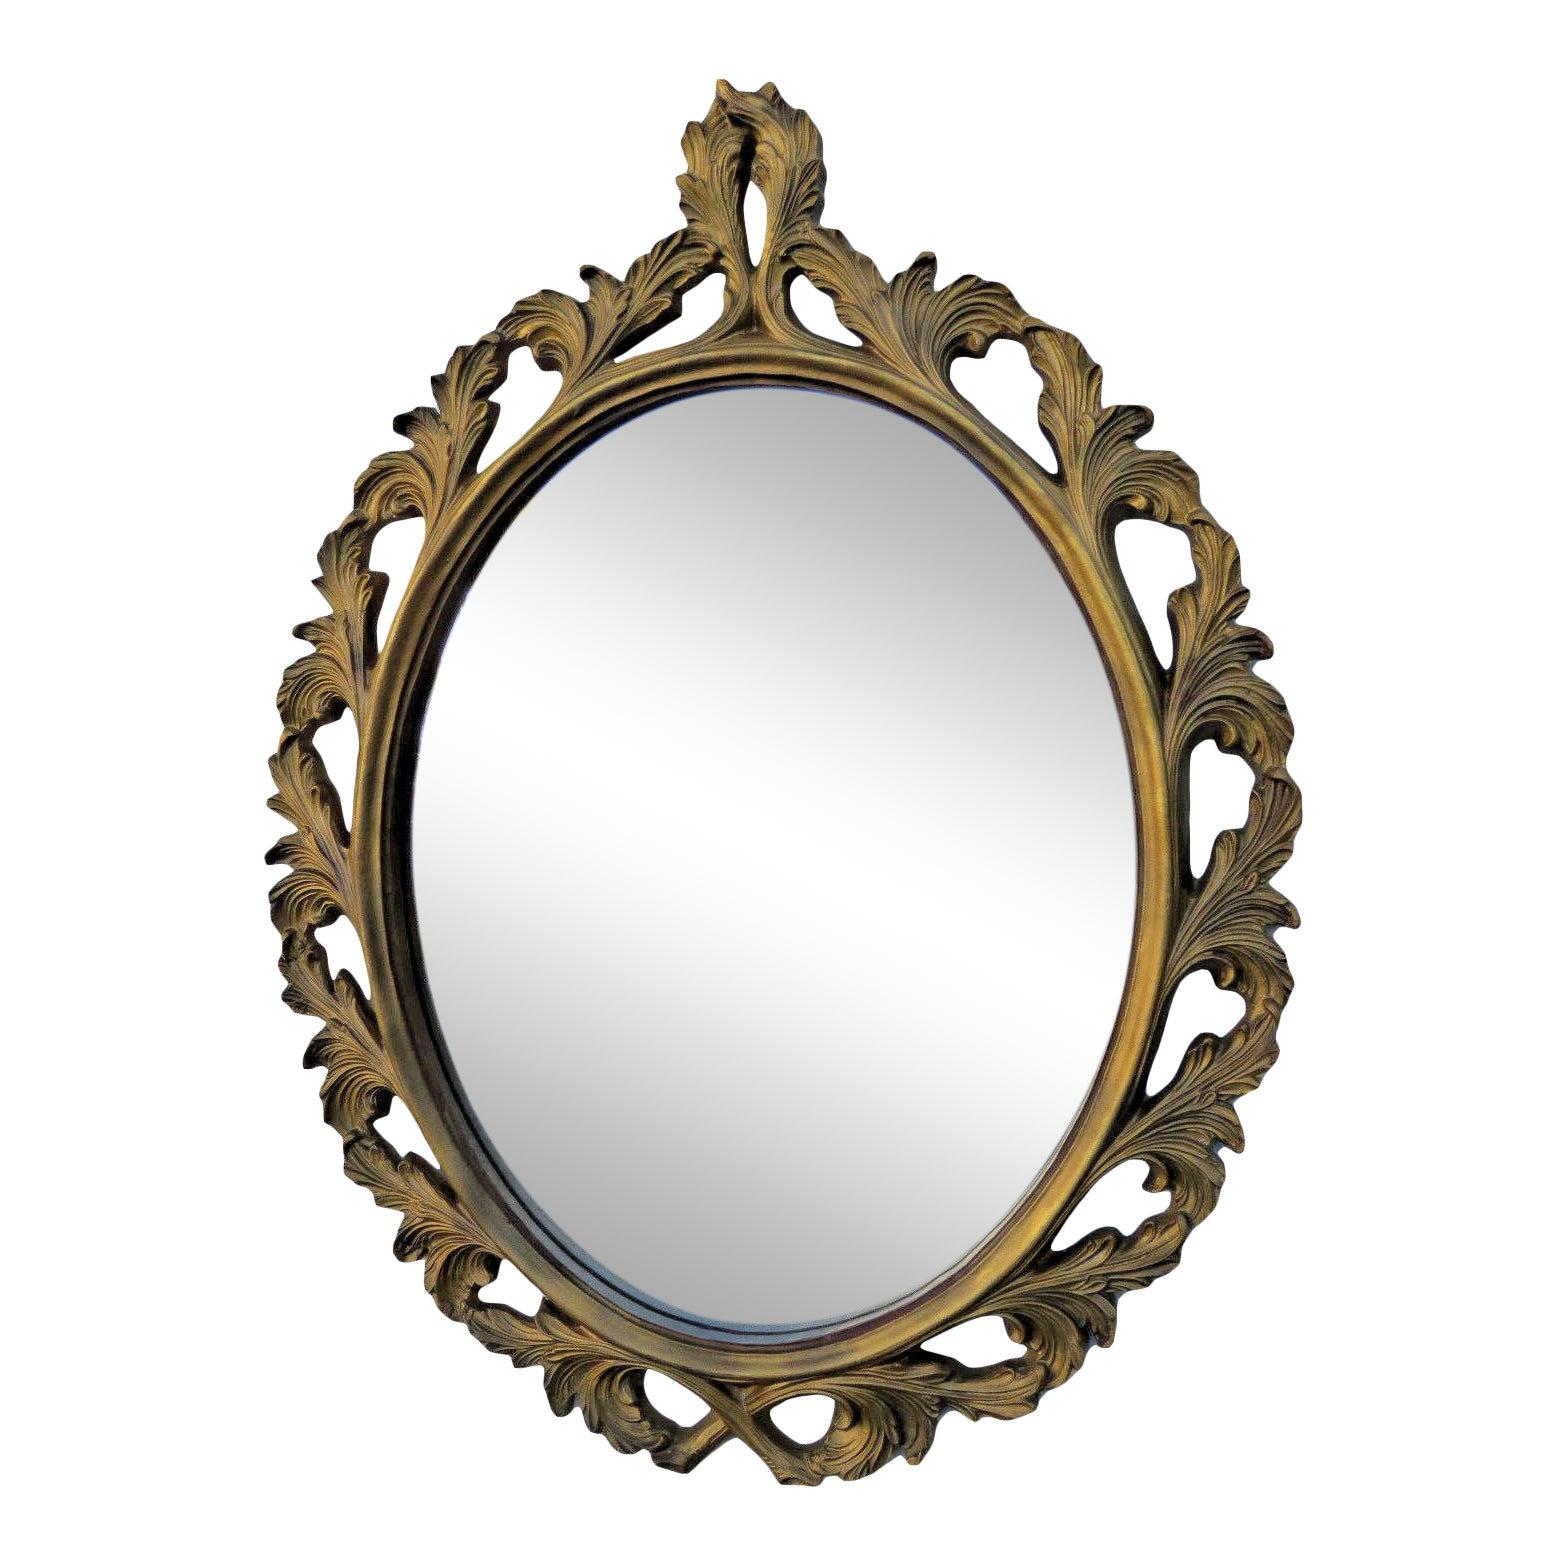 Carved Oval Vintage Distressed Gold Wall Bathroom Vanity Mirror Chairish